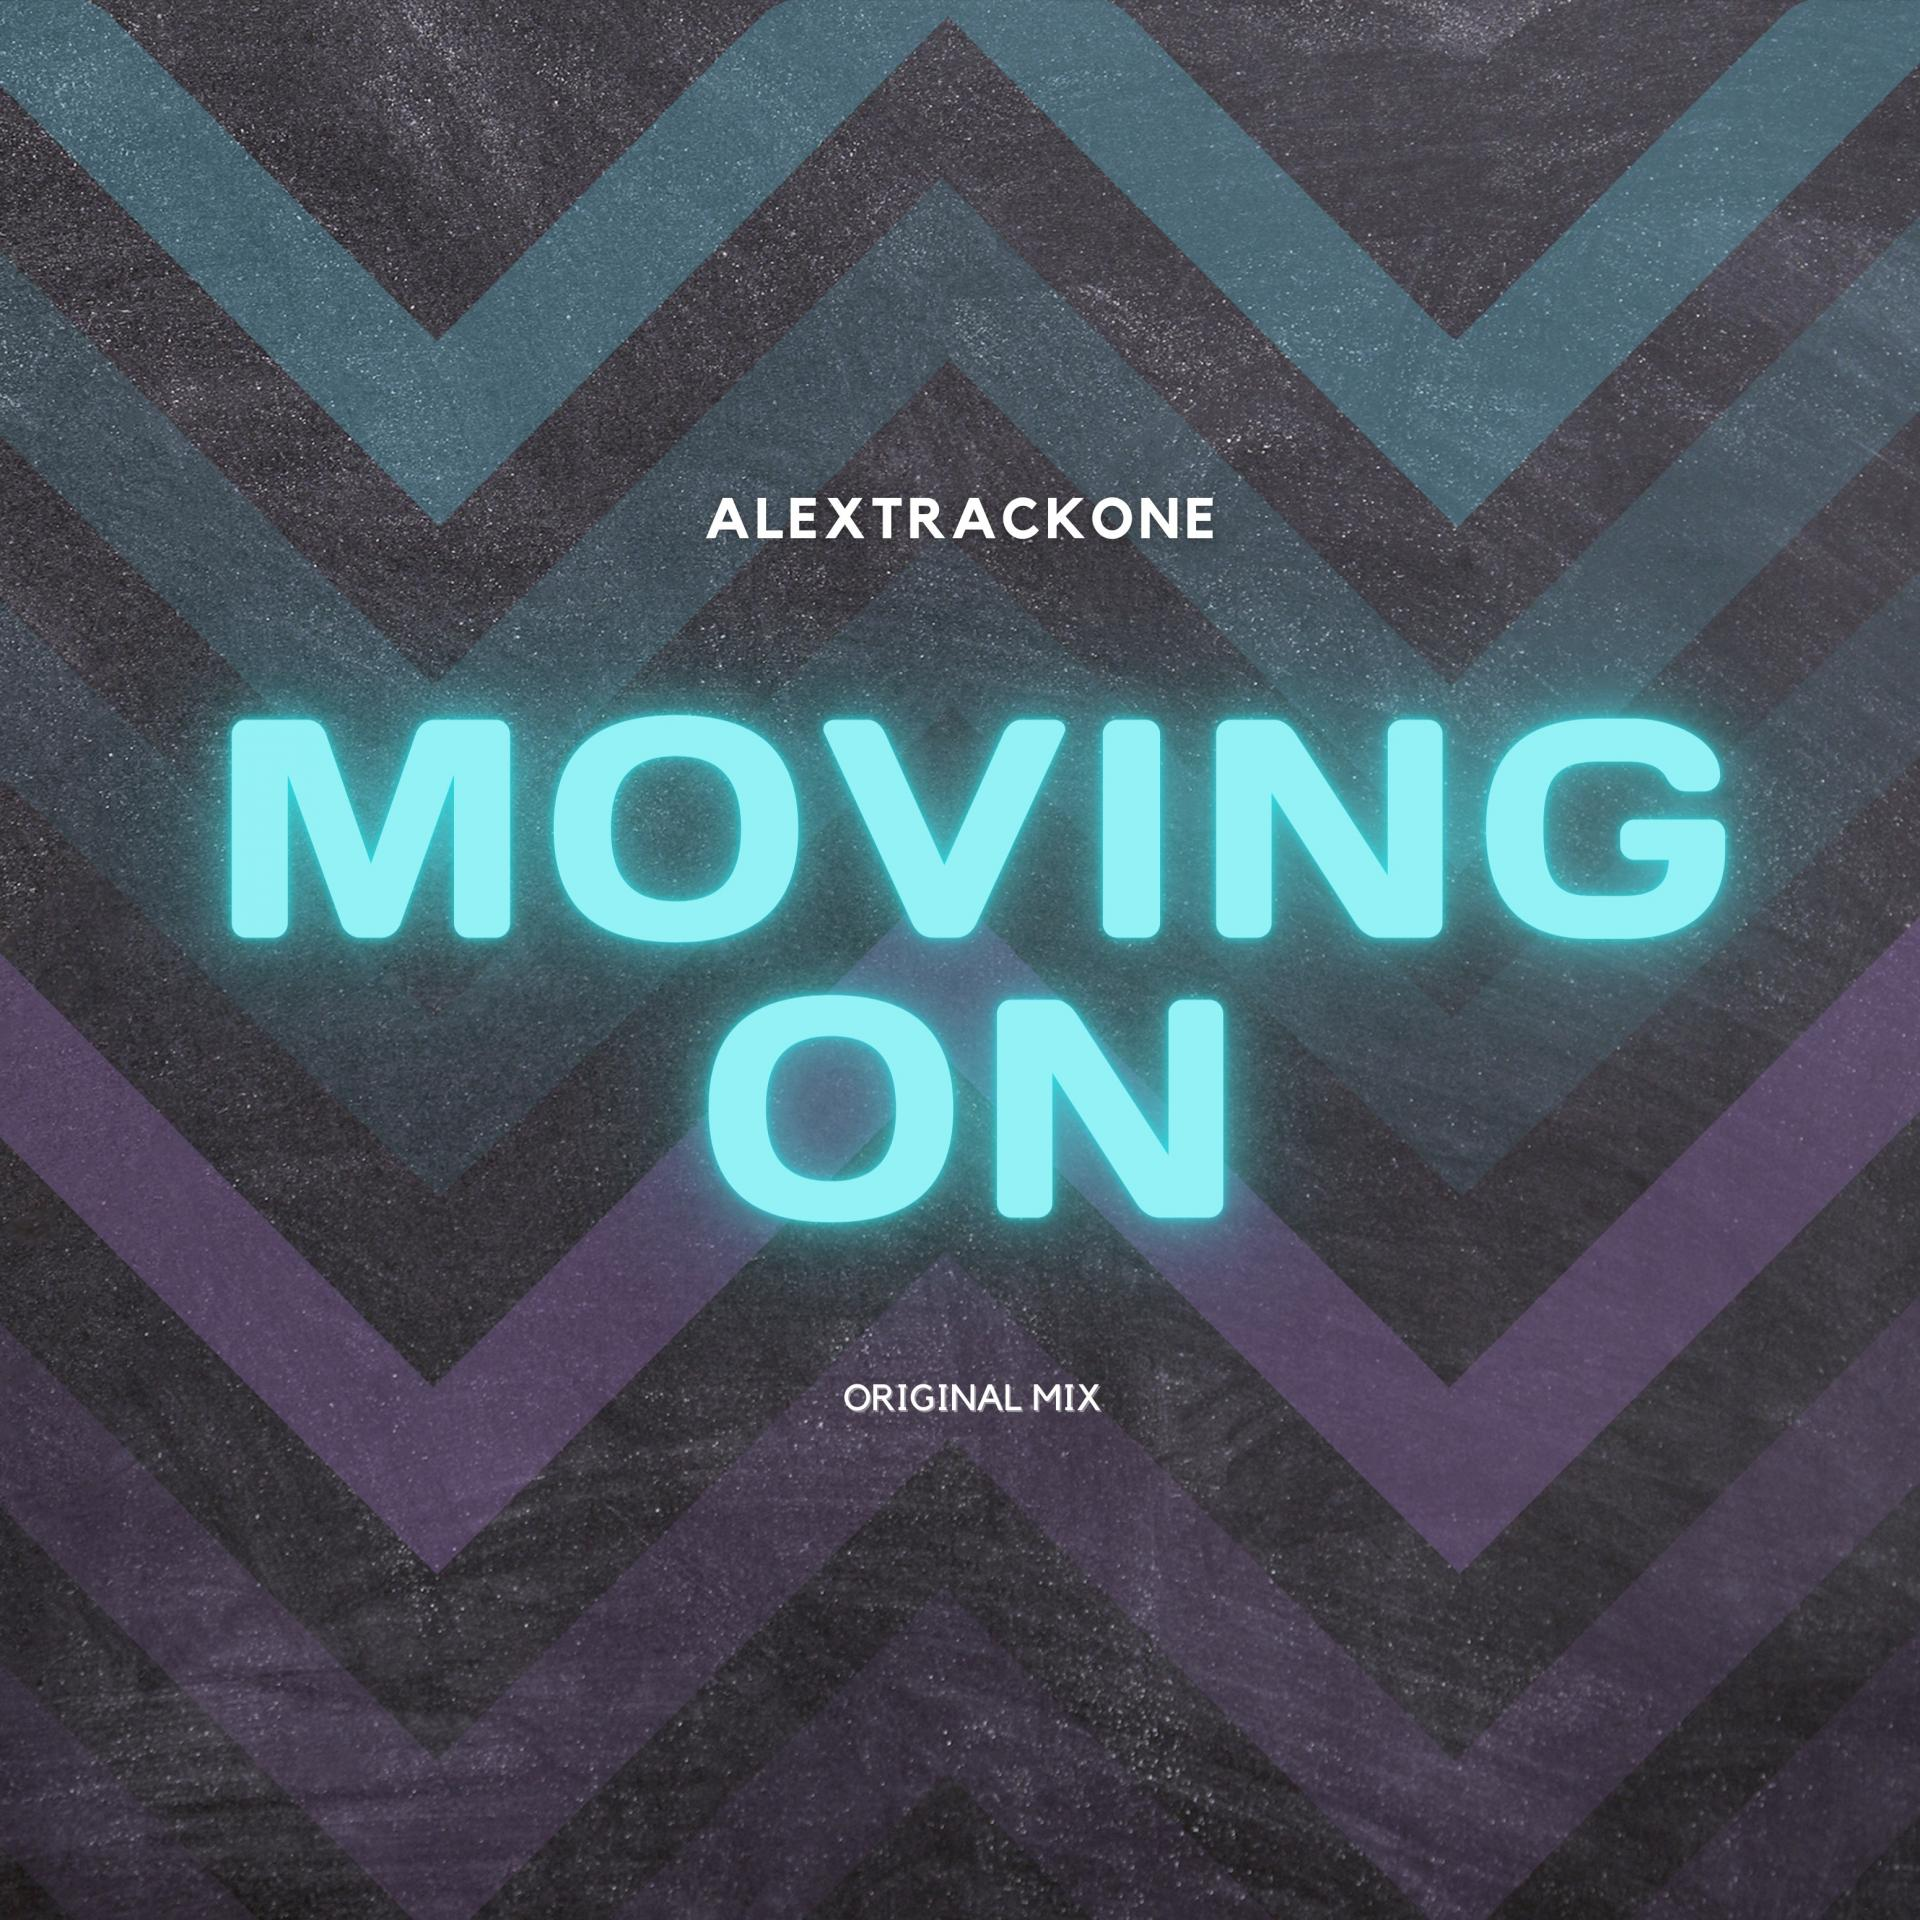 MOVING ON -ORIGINAL MIX-